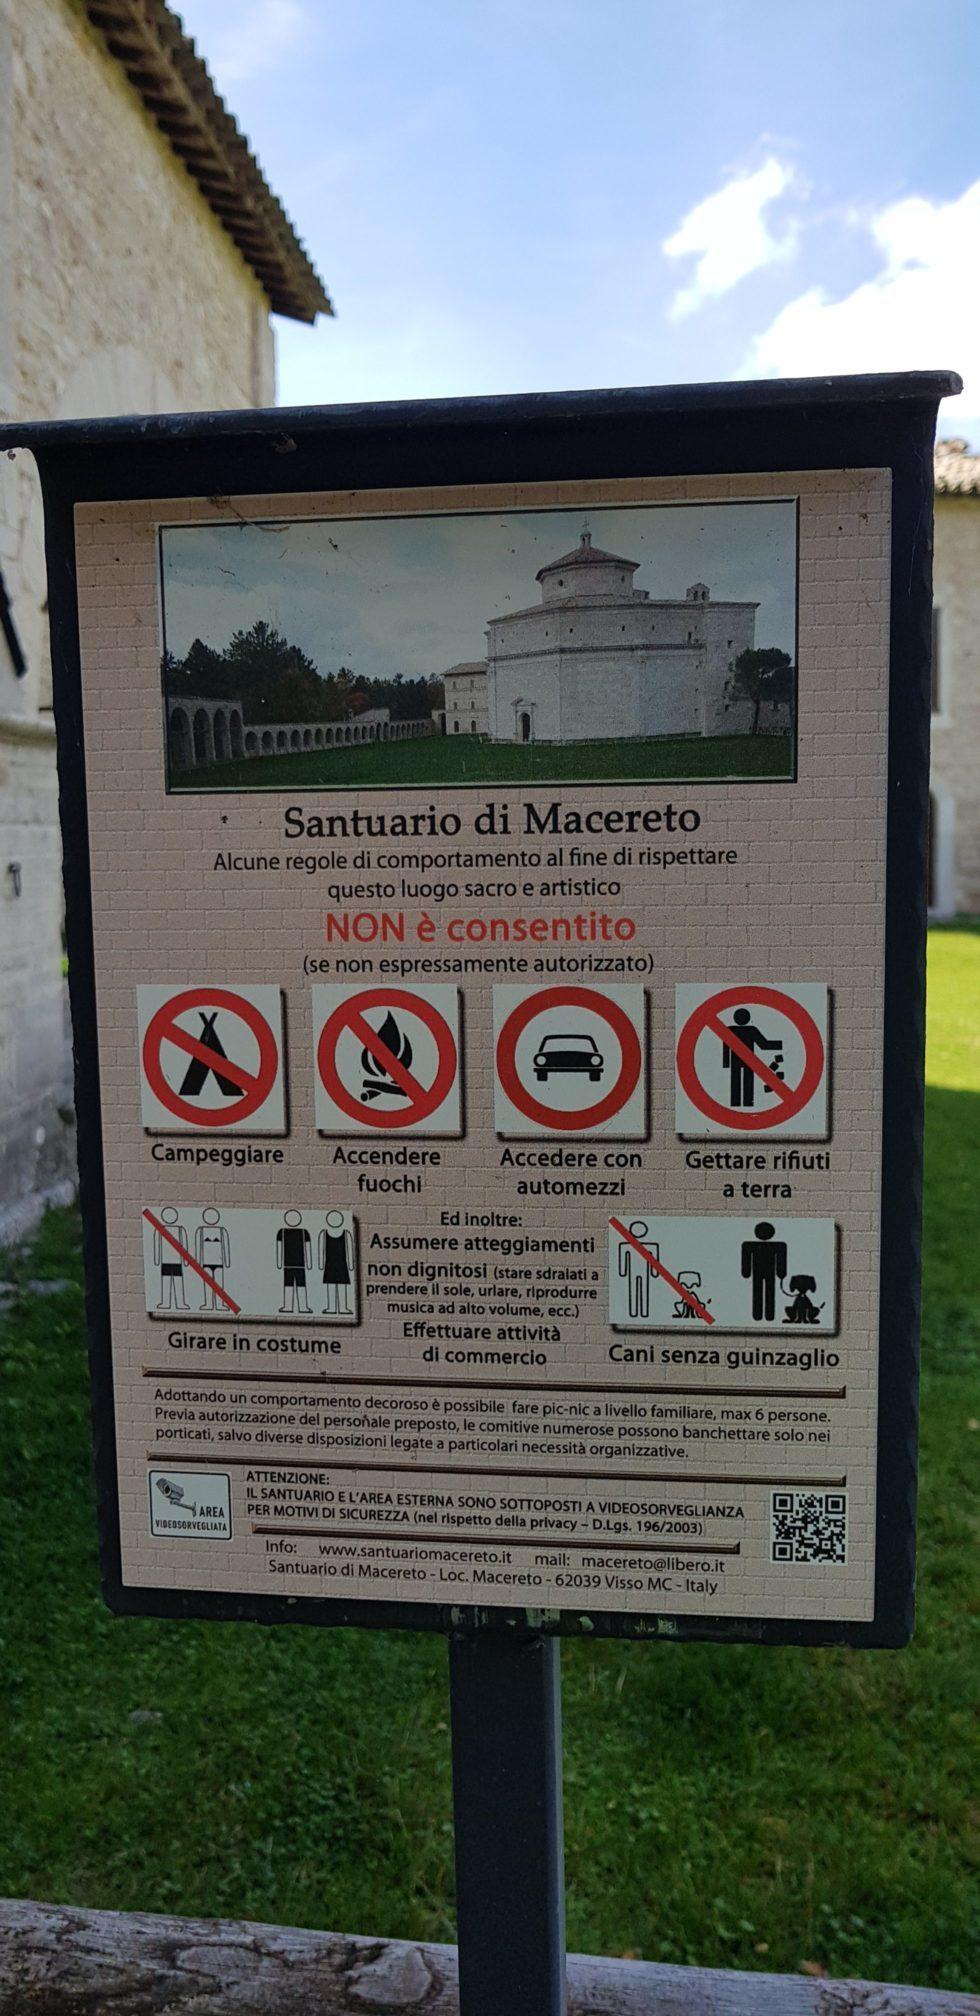 santuario macereto info blog 1